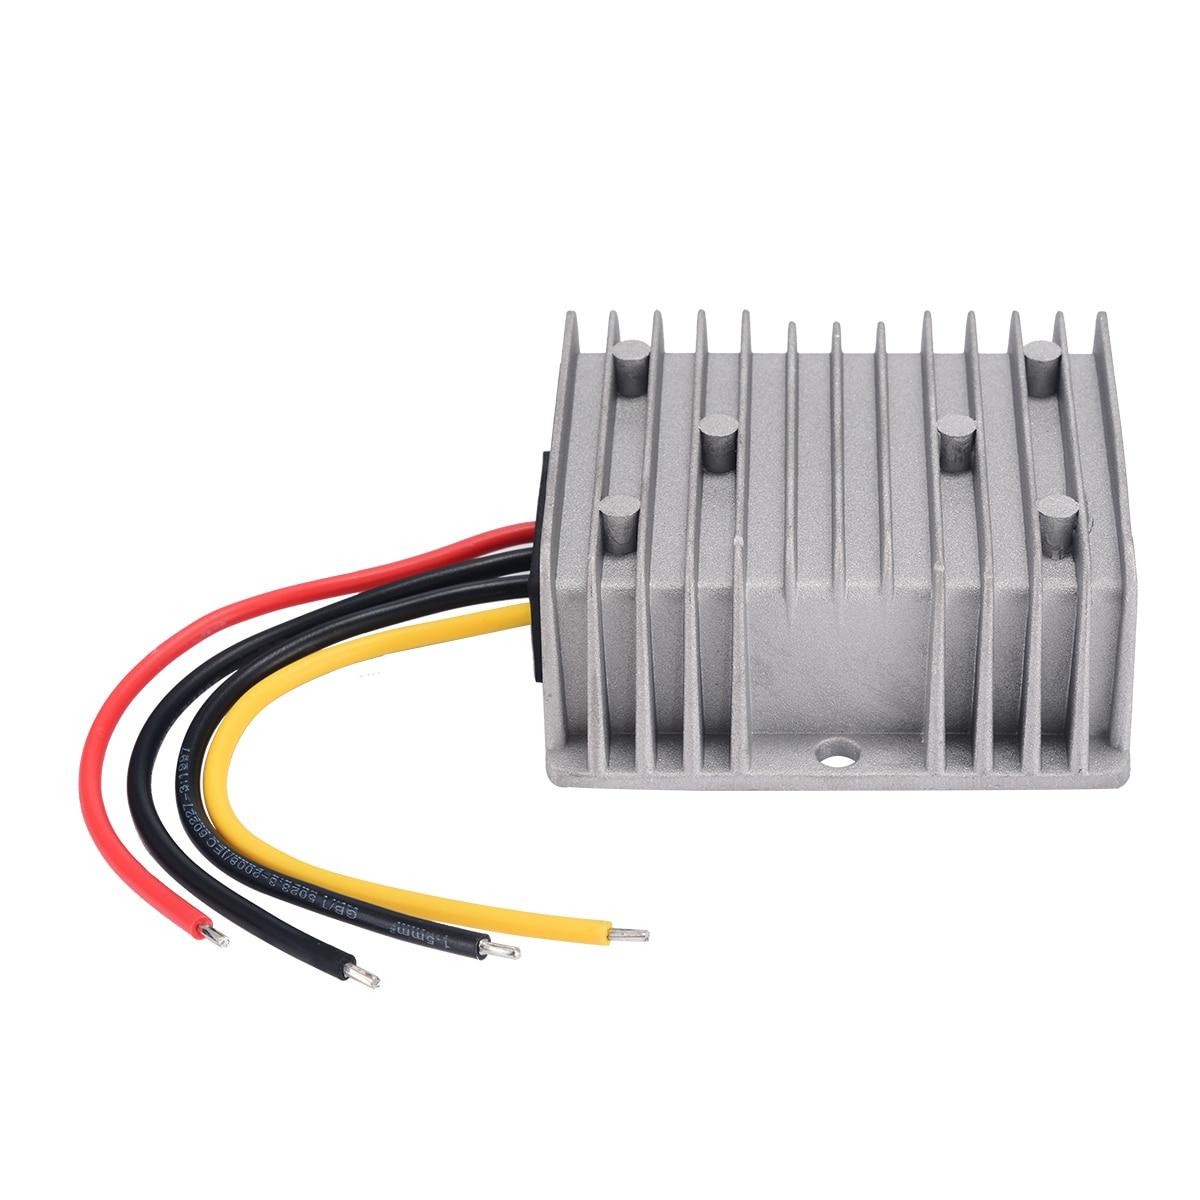 Mayitr Step-Down Converter DC/DC 24V to 12V Car Power Supply Module Regulator 20A 240W Durable Converter